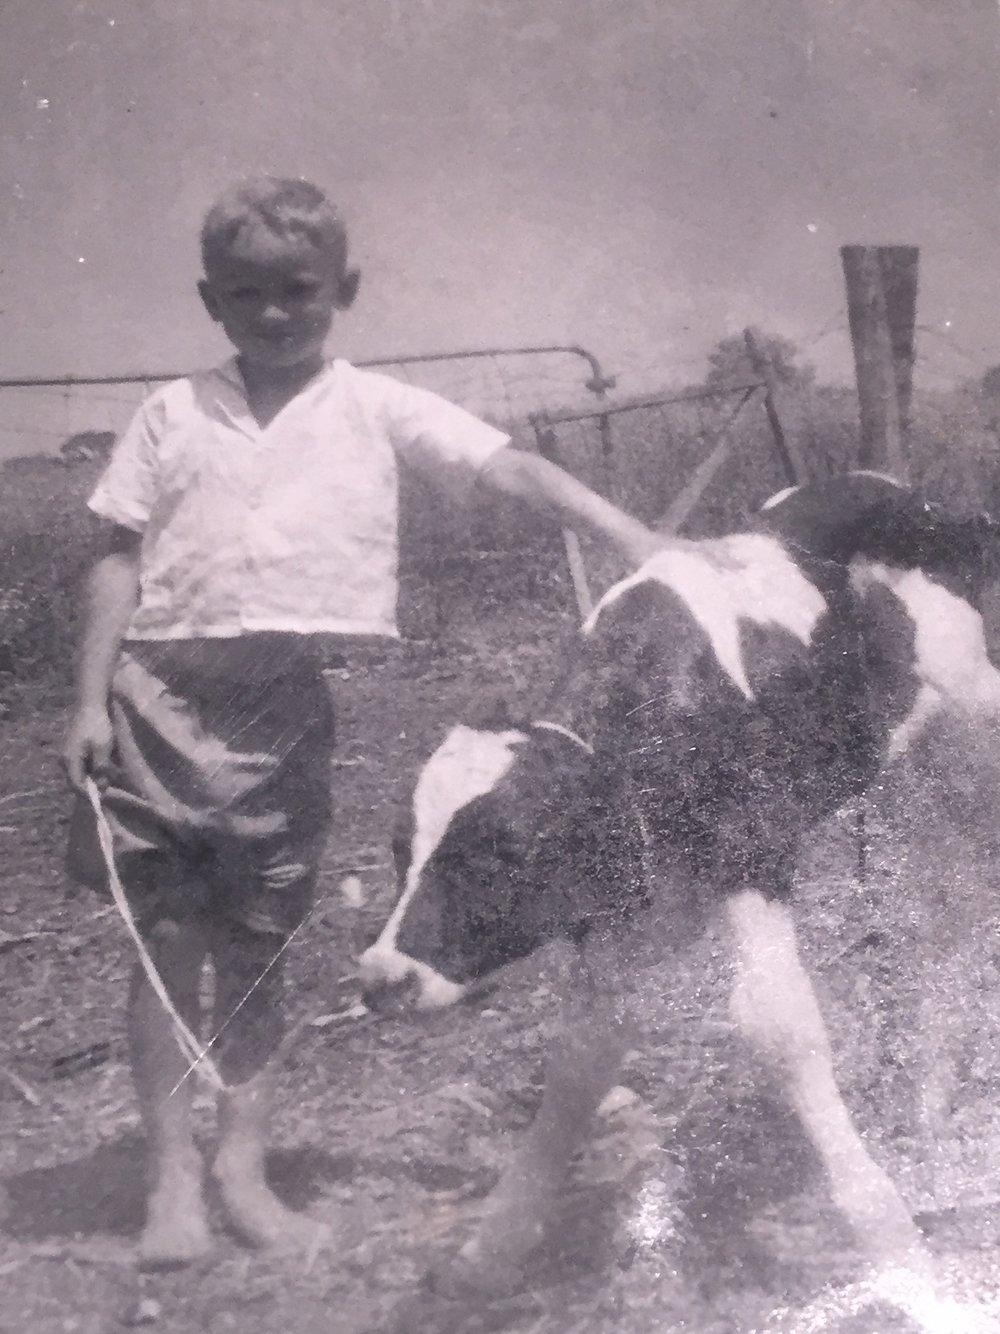 Robert grew up on the farm